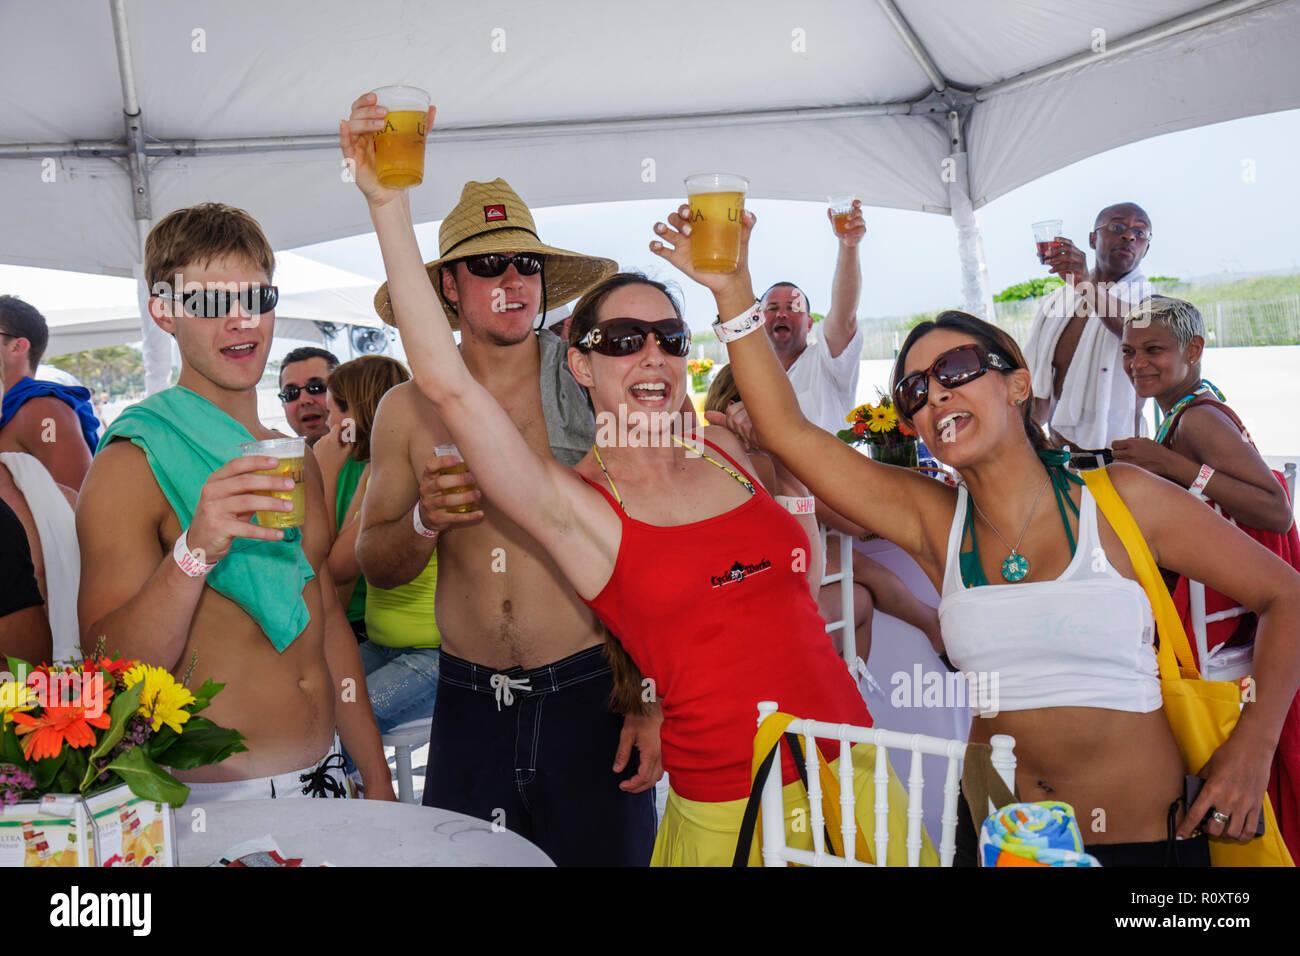 Miami Beach Florida Lummus Park Shape Bikini Body Tour fitness festival fair free Michelob beer Hispanic man woman drinking alco - Stock Image